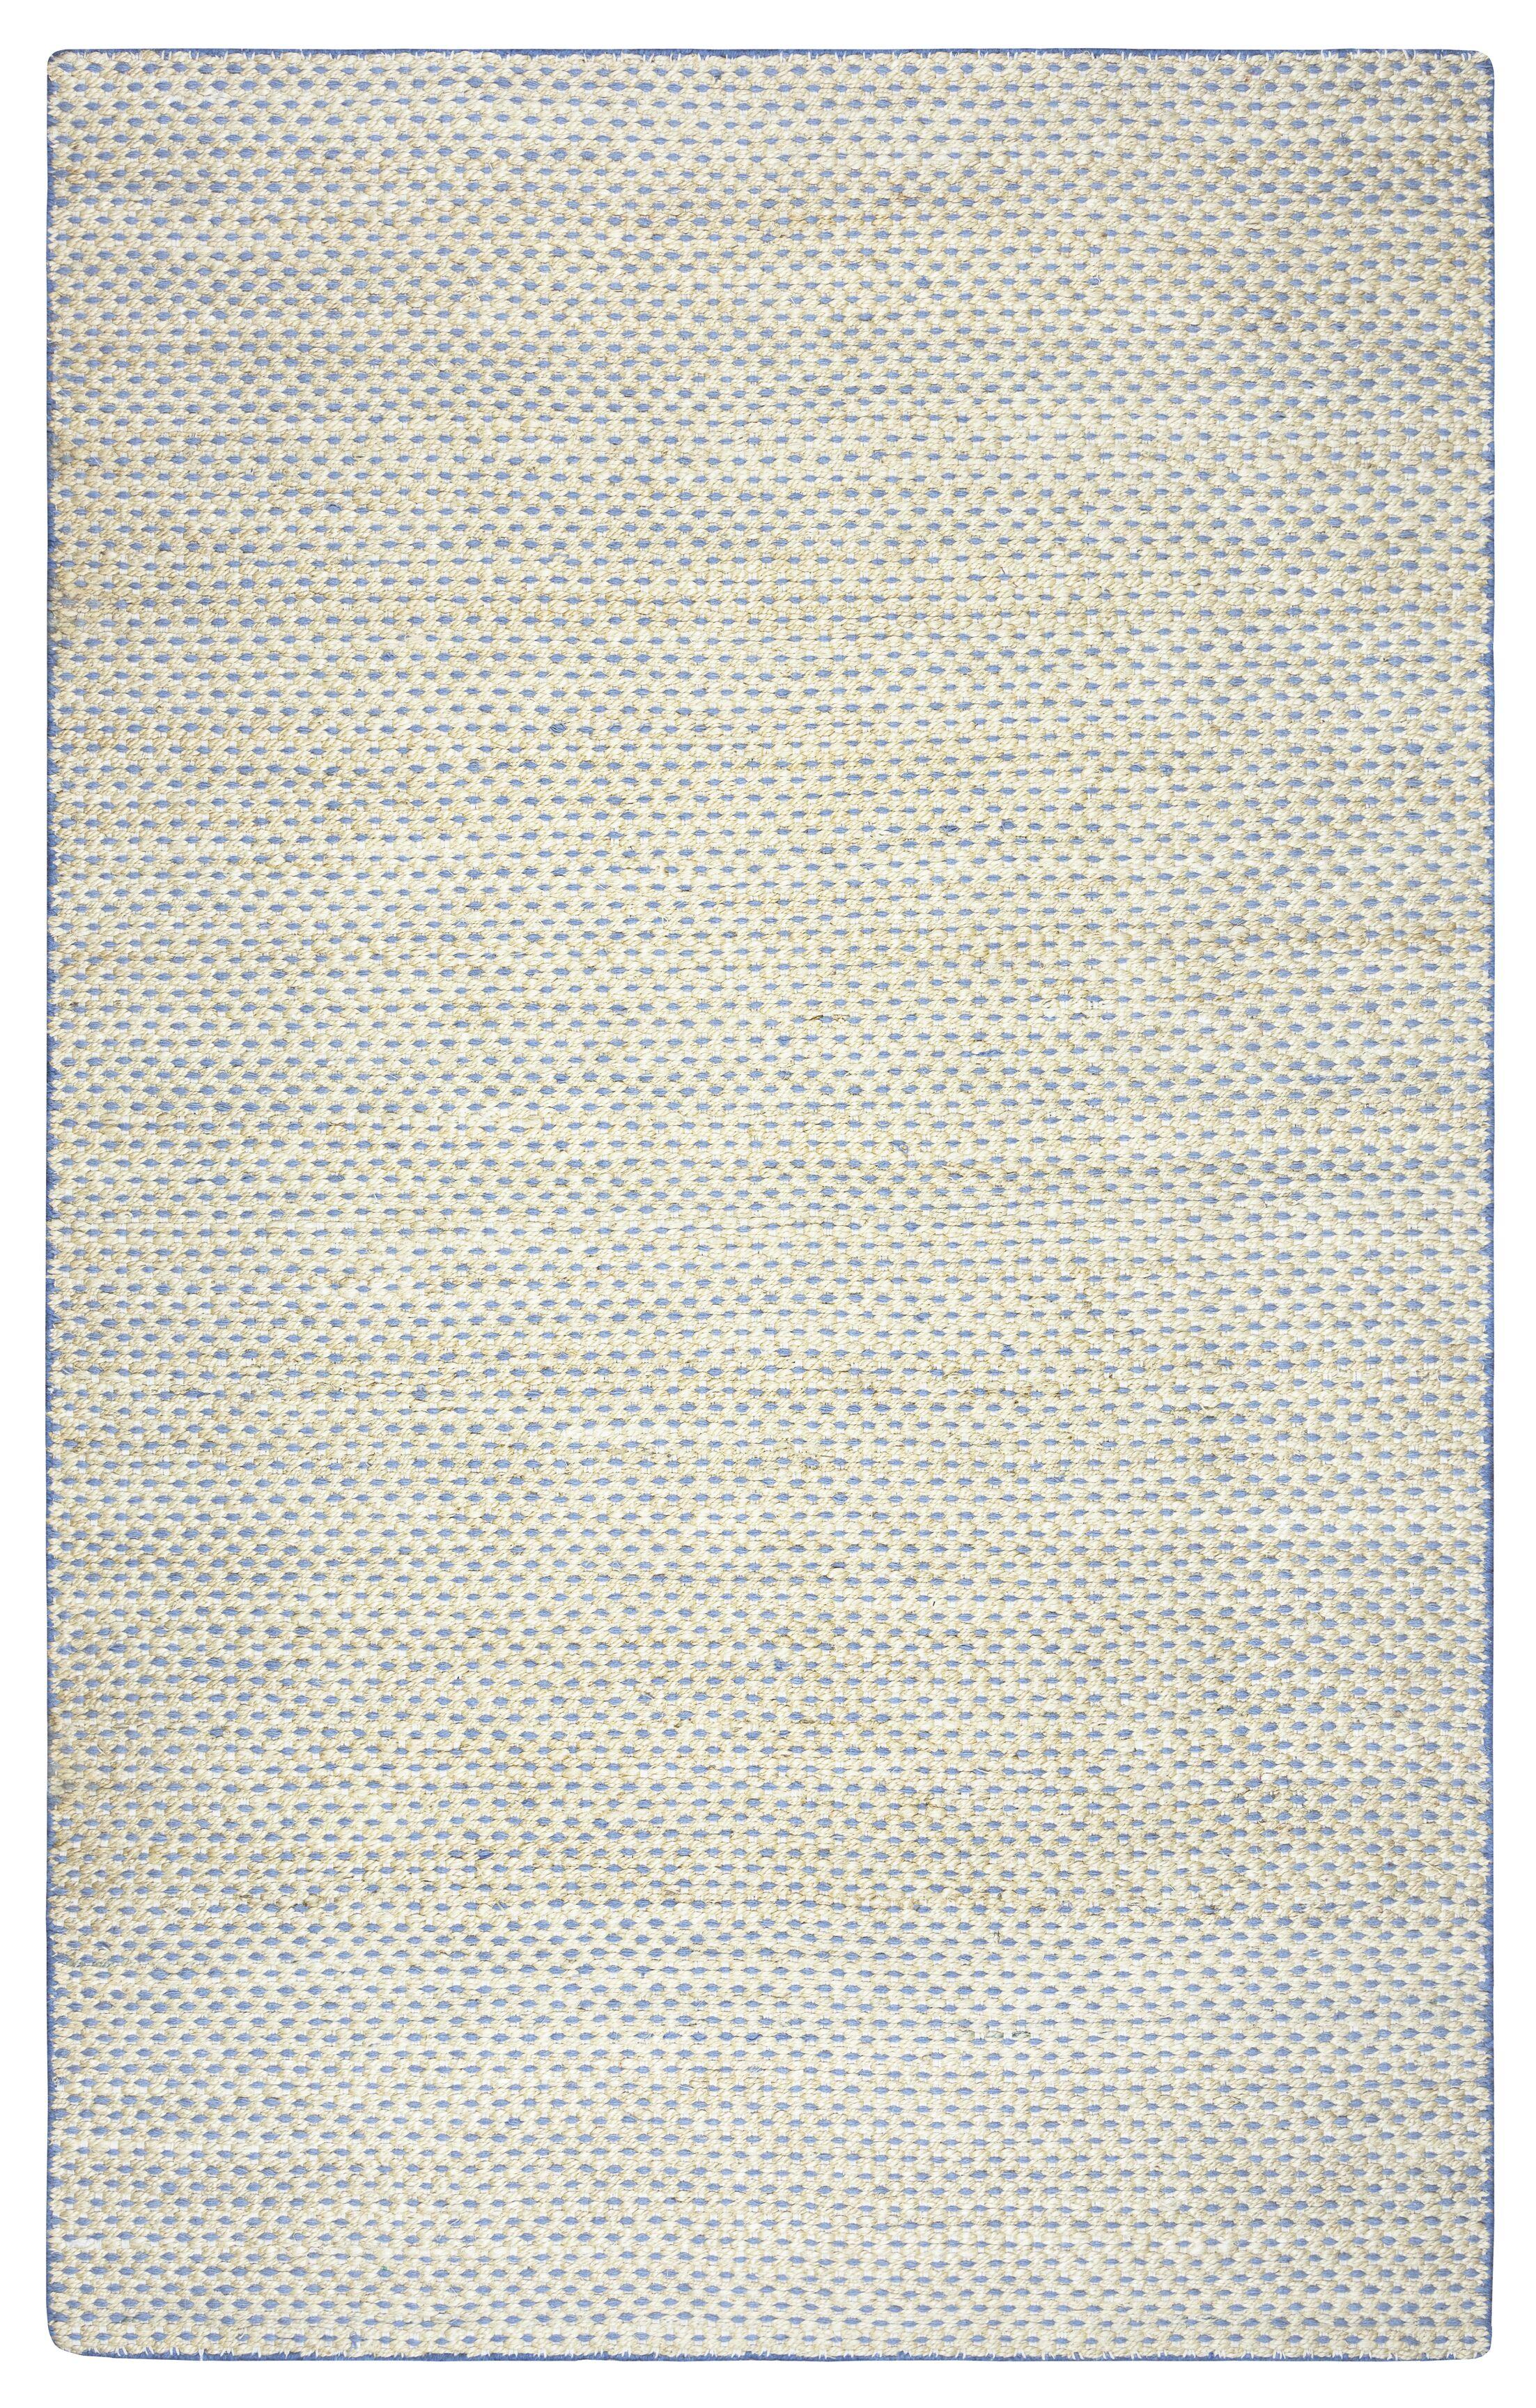 Hypoluxo Hand-Loomed Tan Area Rug Rug Size: Rectangle 5' x 8'